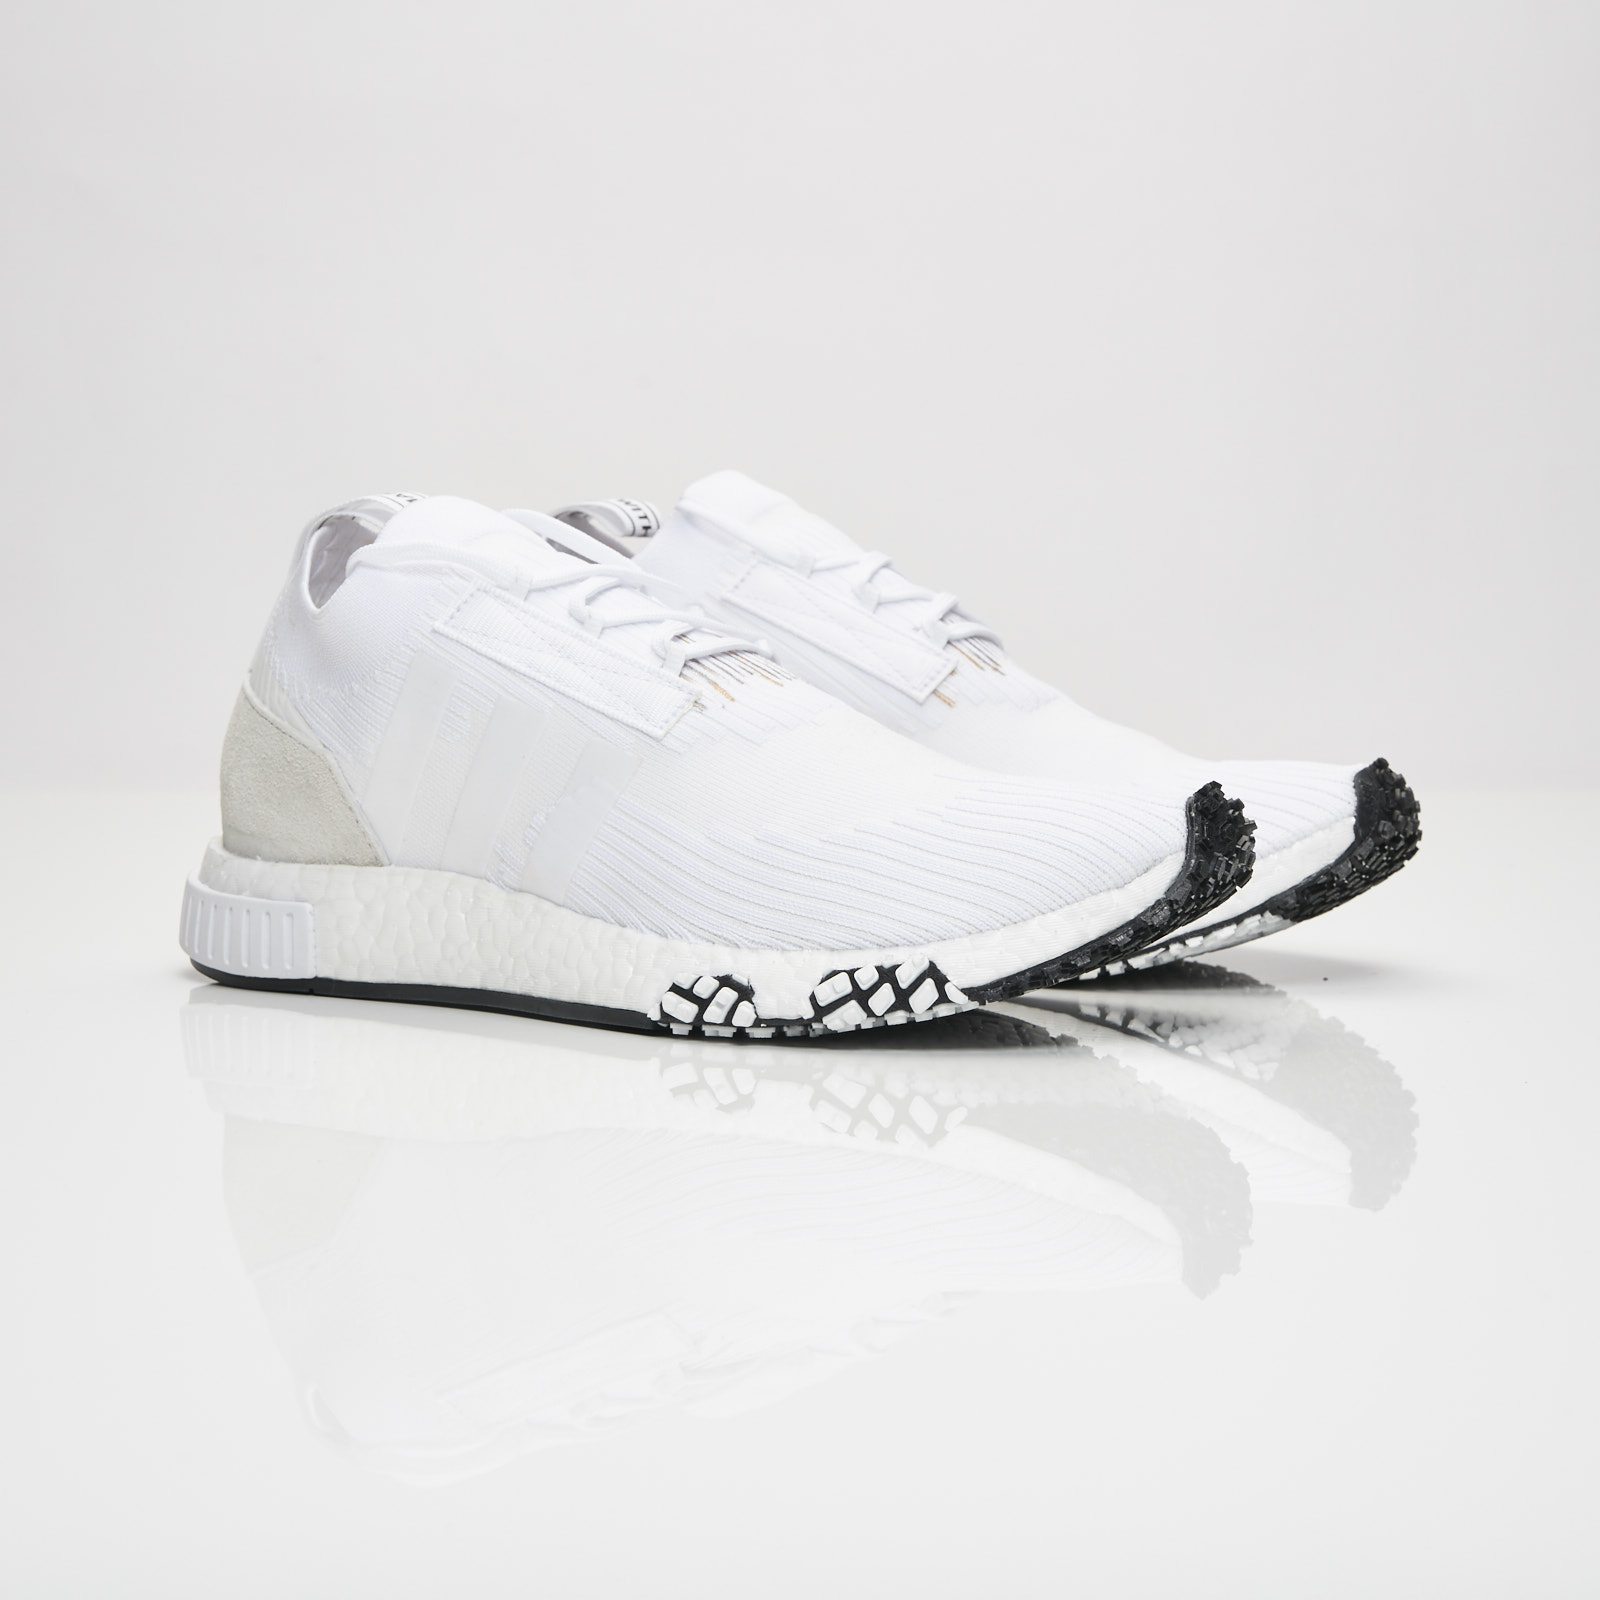 458705ab0 adidas NMD RACER PK - B37639 - Sneakersnstuff